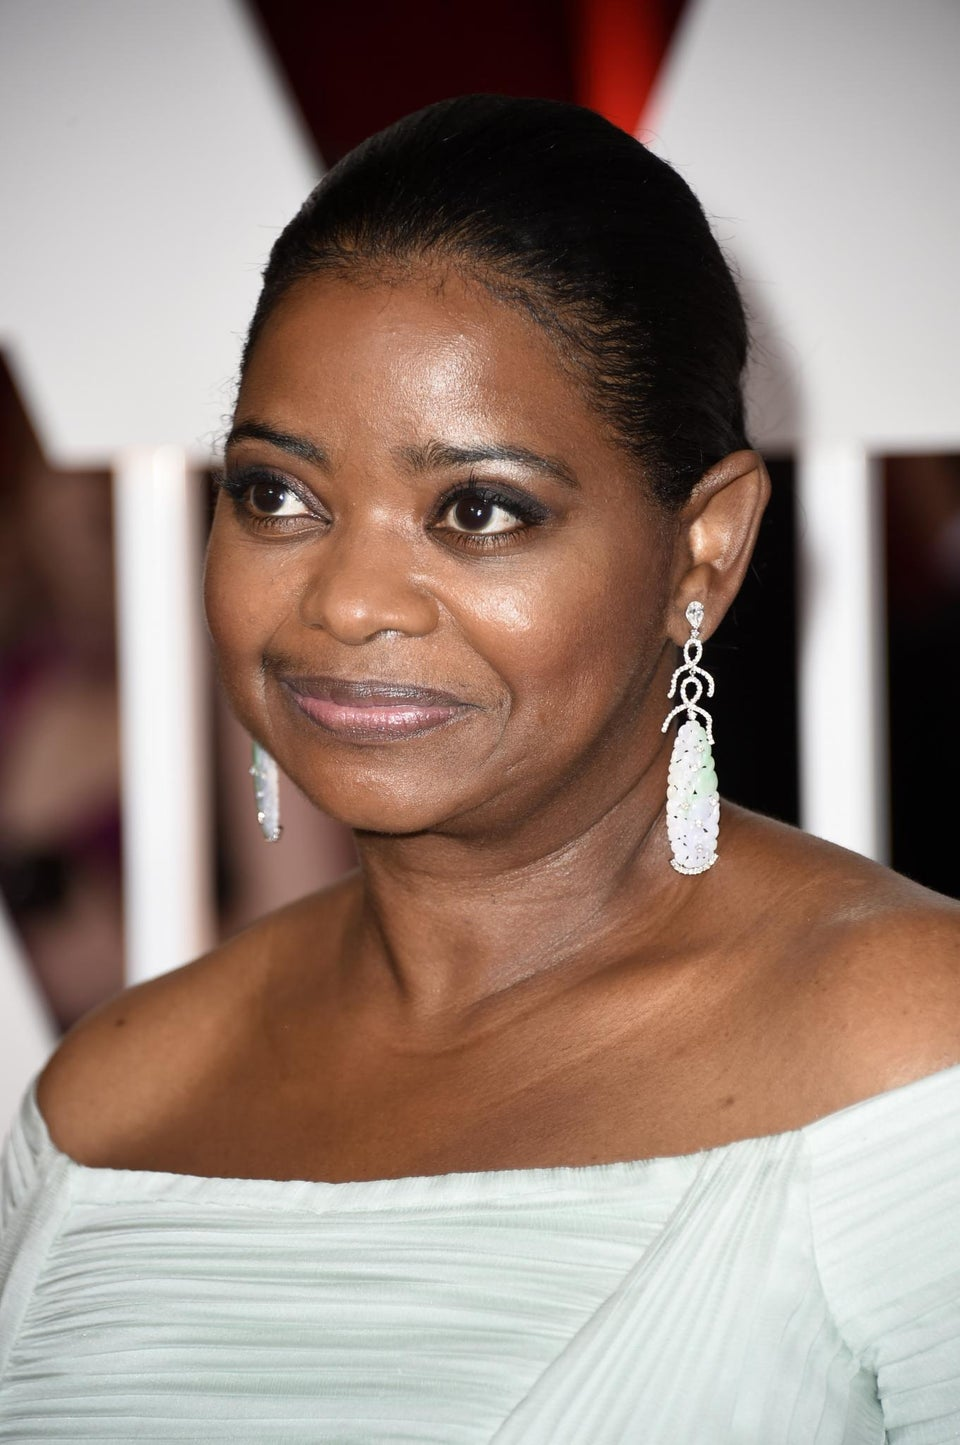 Octavia Spencer Addresses Hollywood's Diversity Woes, New film 'Hidden Figures'